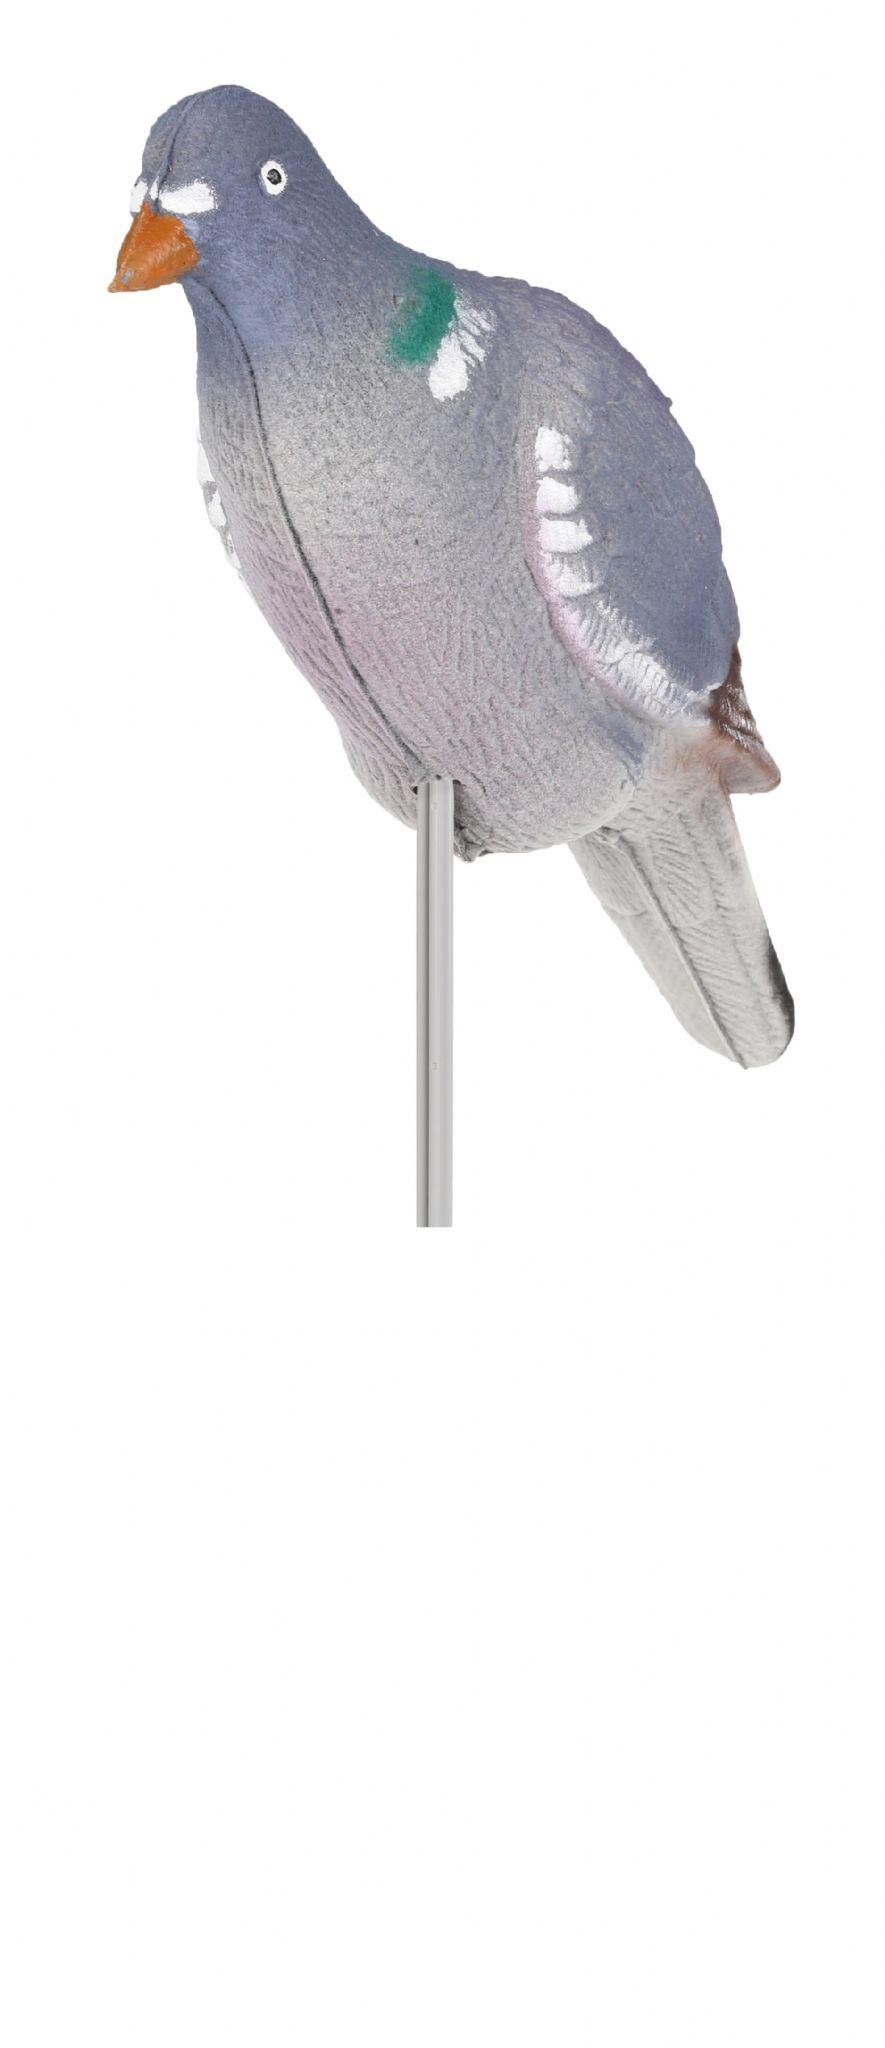 5 X Lightweight Flocked Full Body Pigeon Decoy High Definition + Stick  Decoying